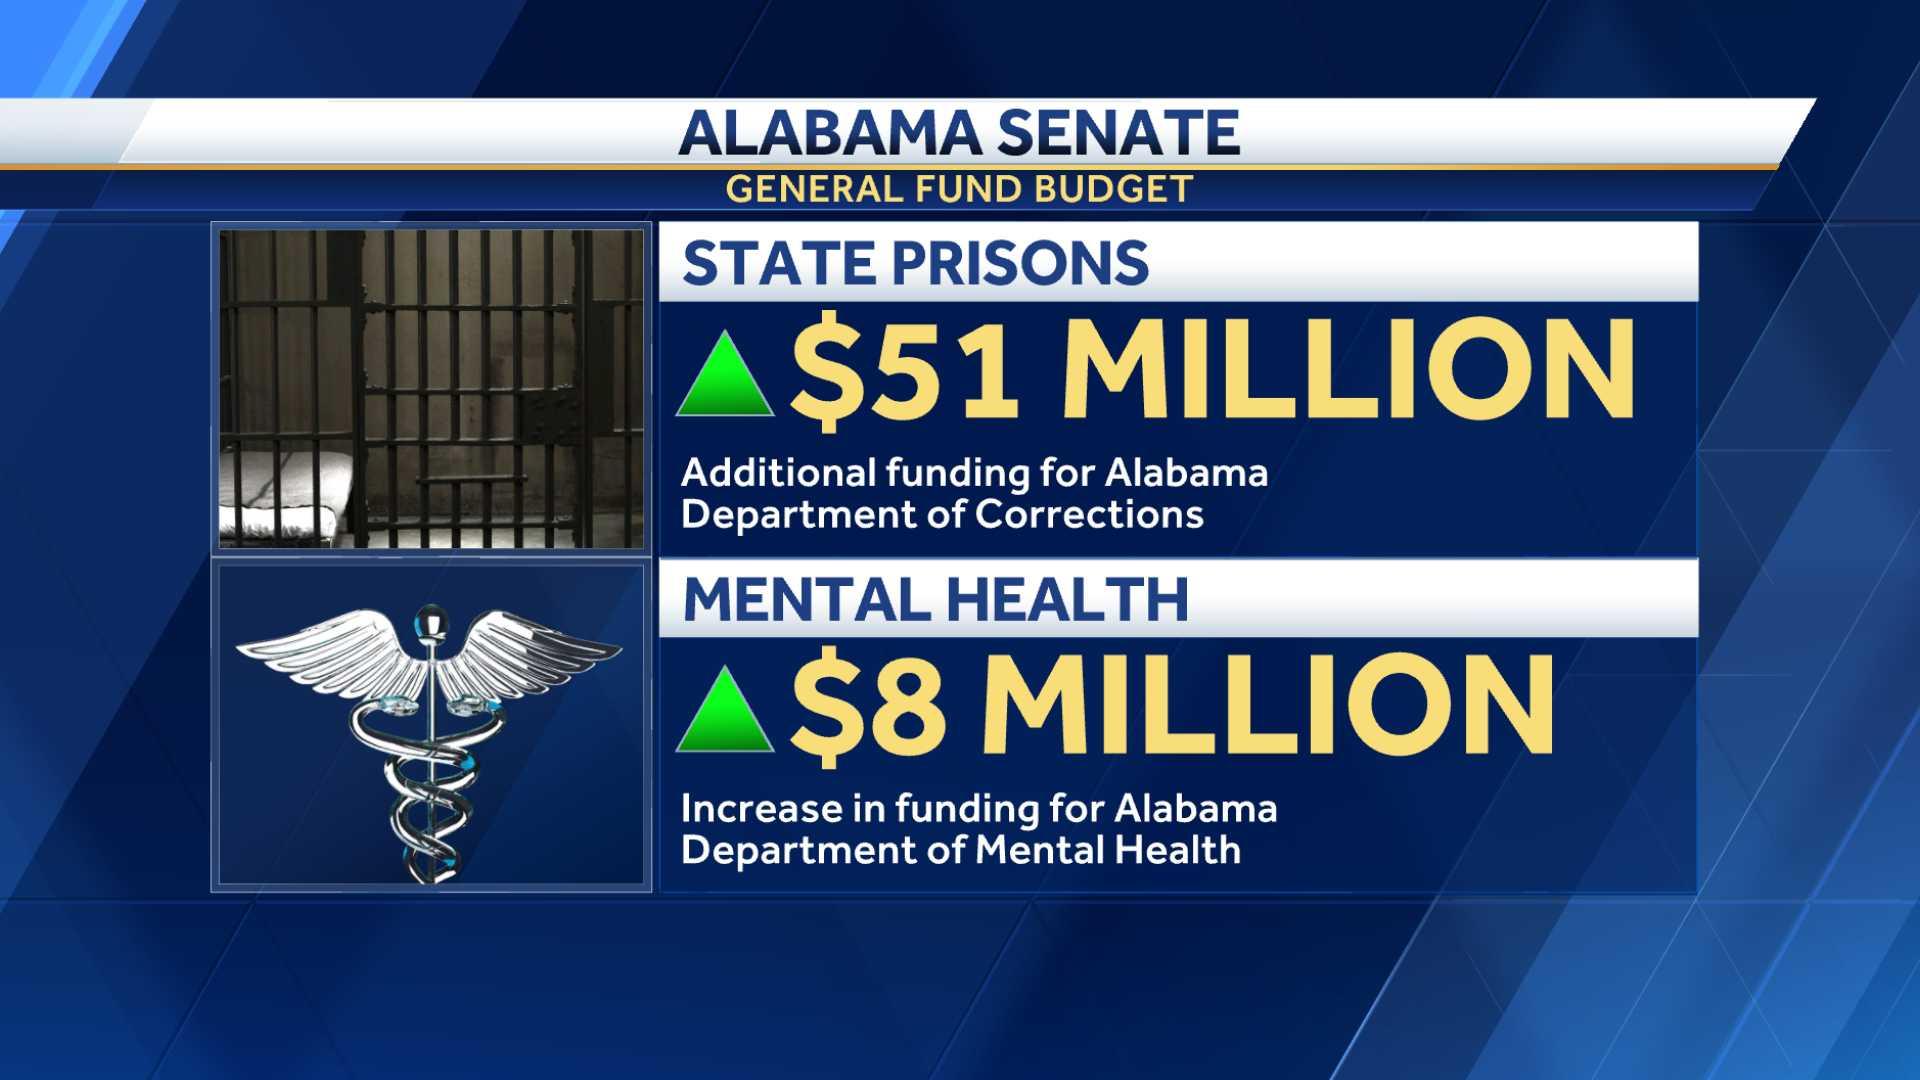 Alabama Senate General Fund Budget